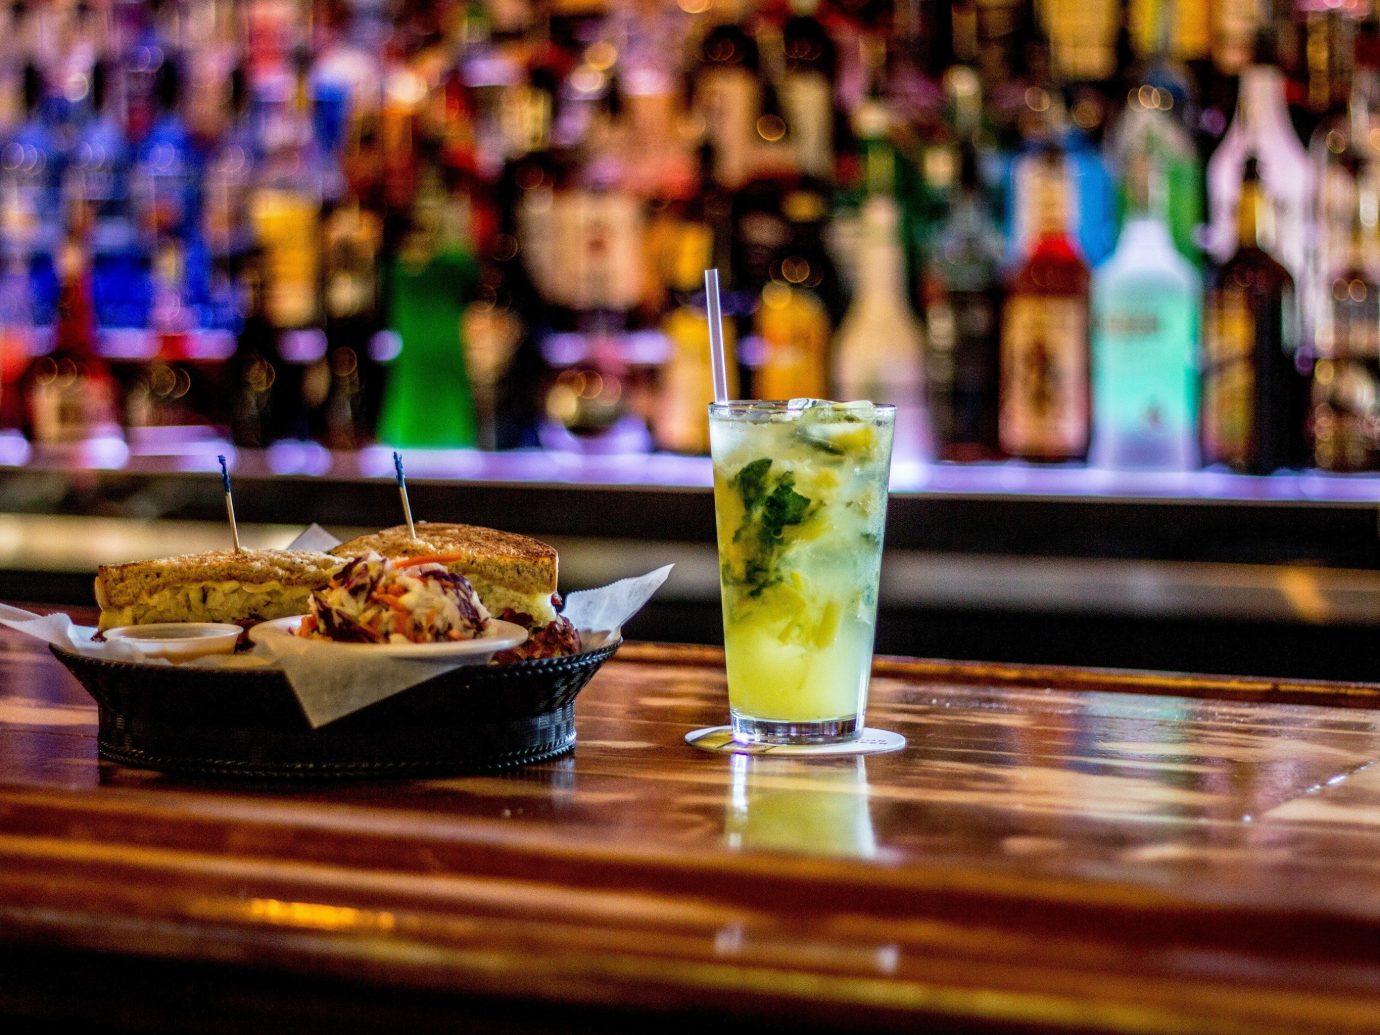 Beach table indoor Bar meal restaurant Drink sense counter